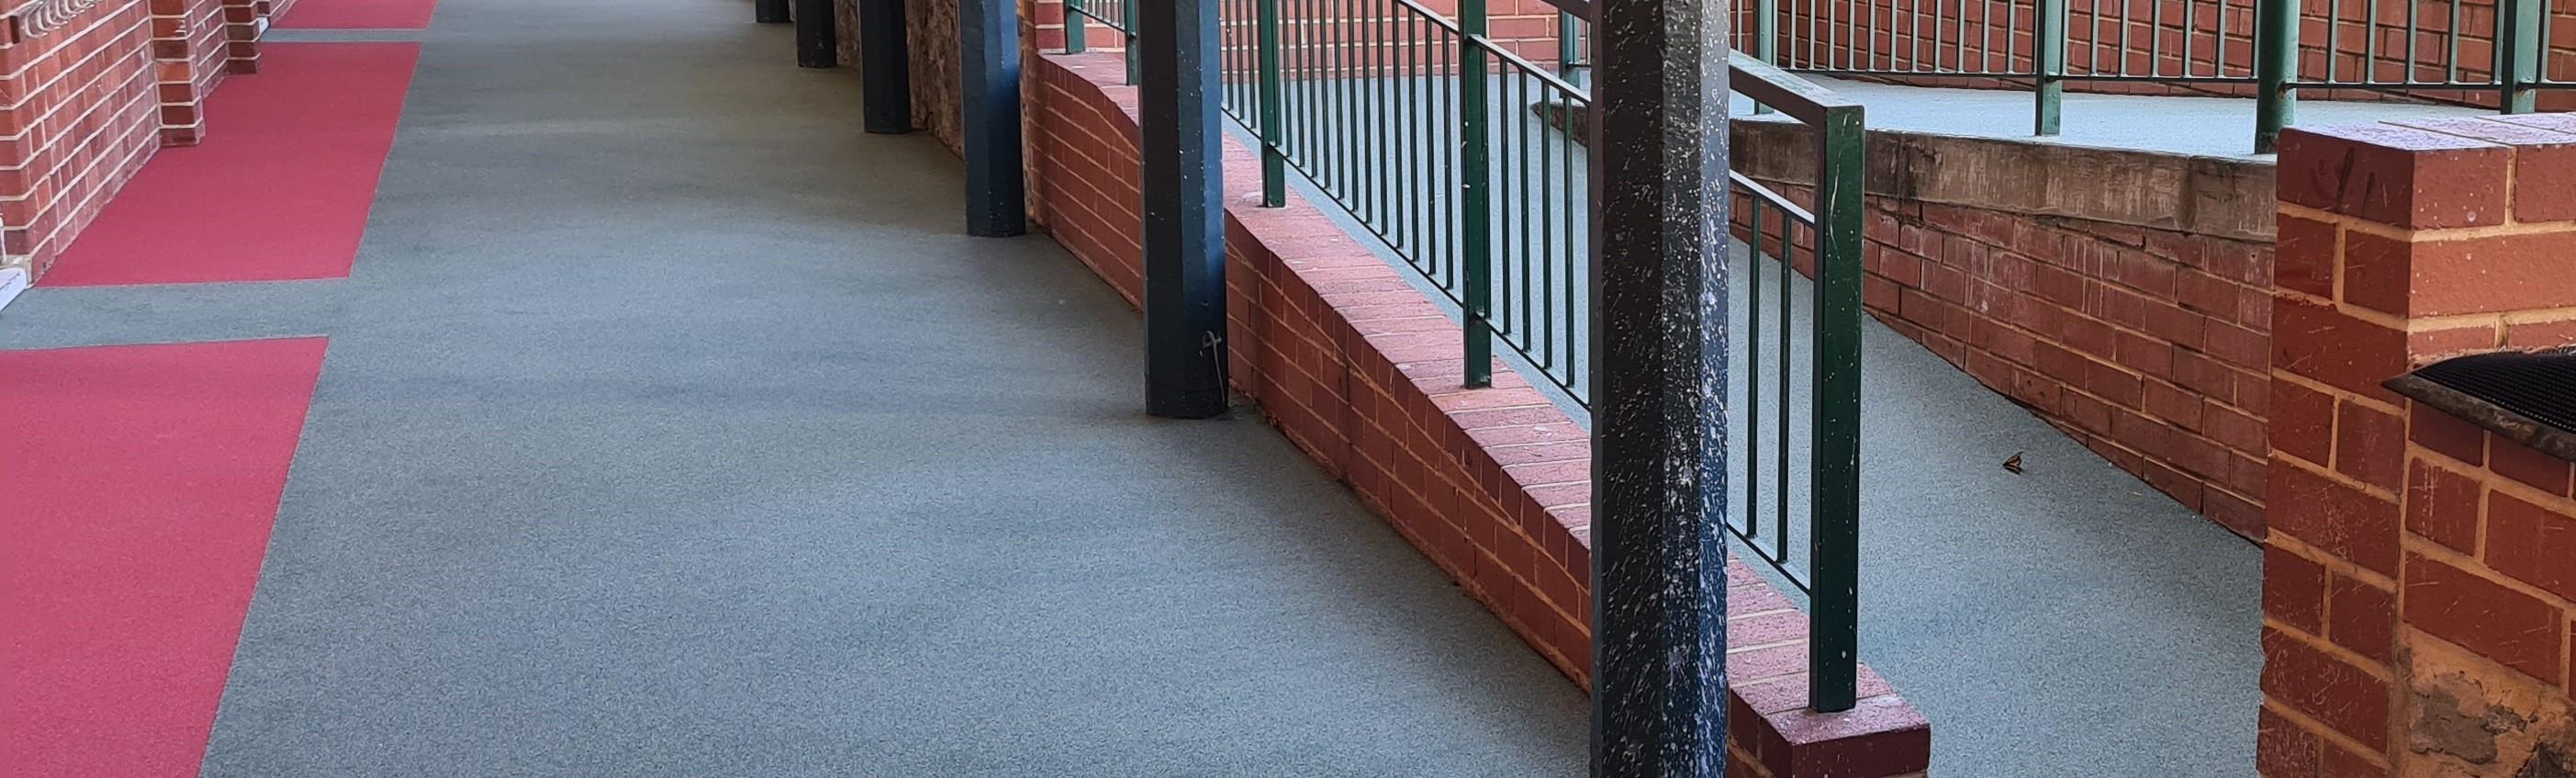 School Balcony & Ramp